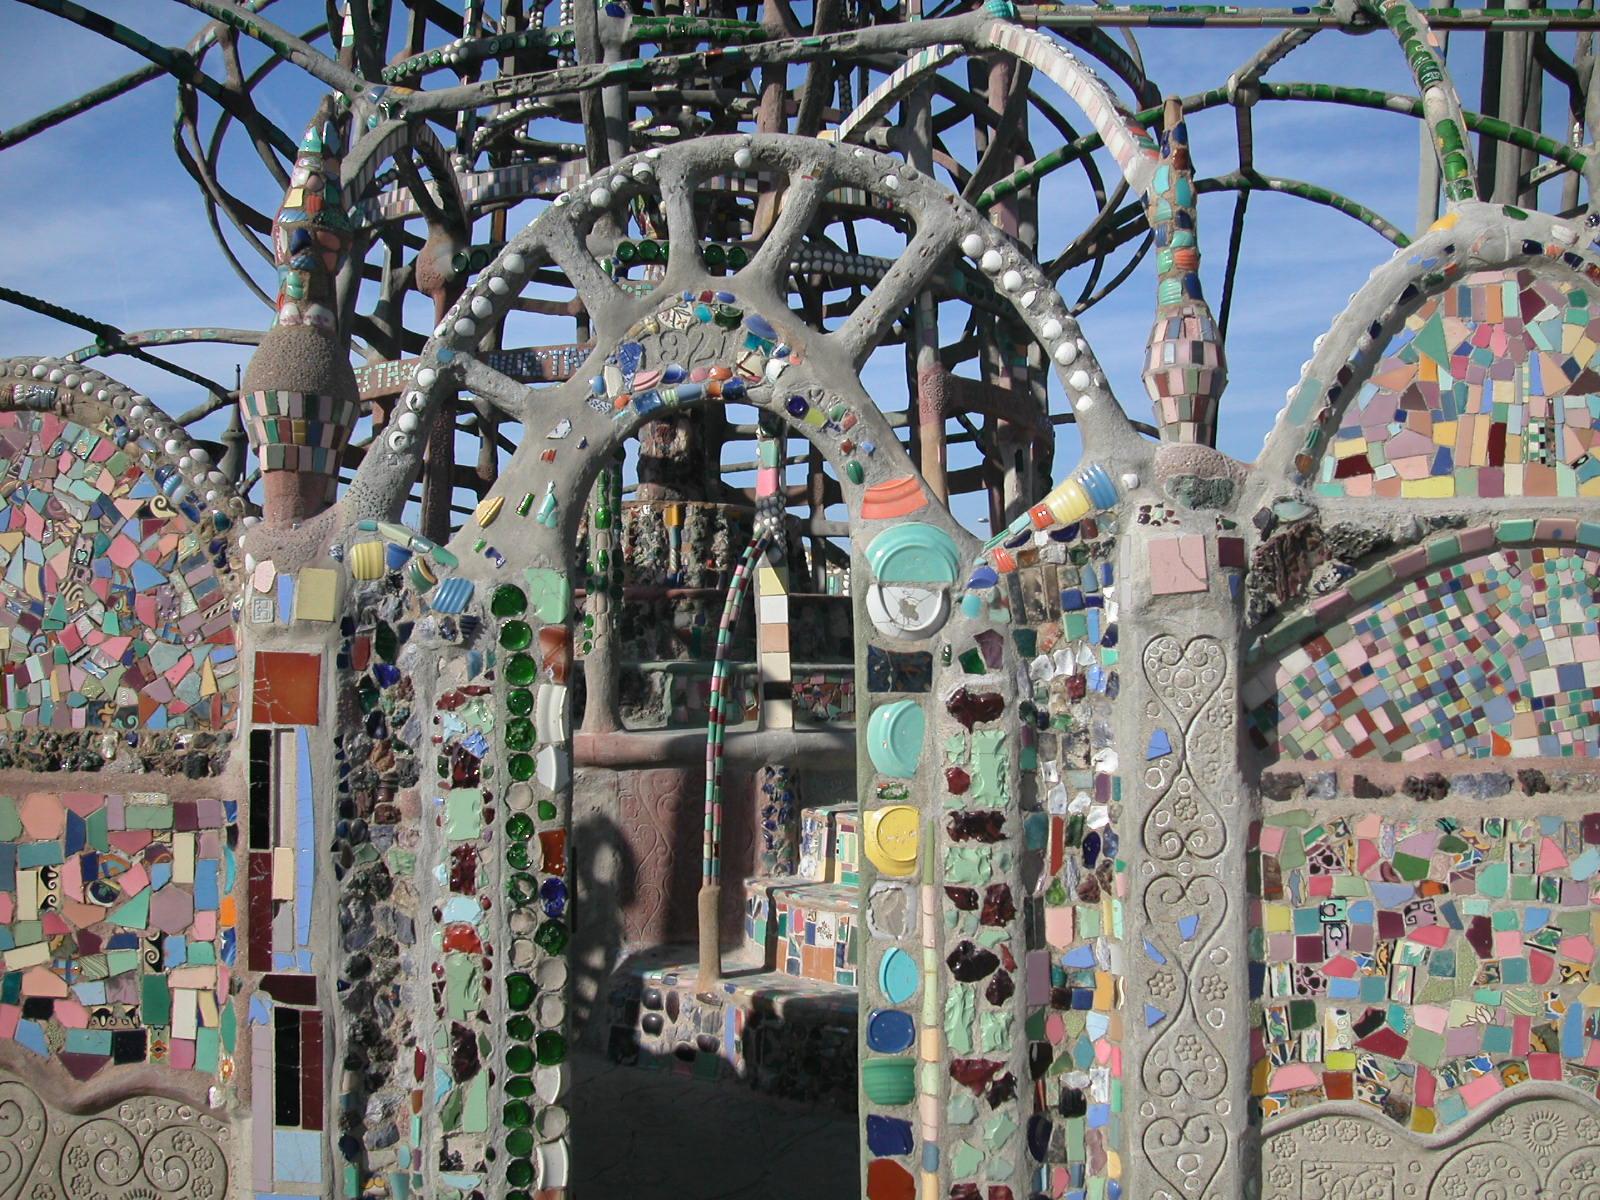 History Los Angeles County Watts Towers as Mosaic Art